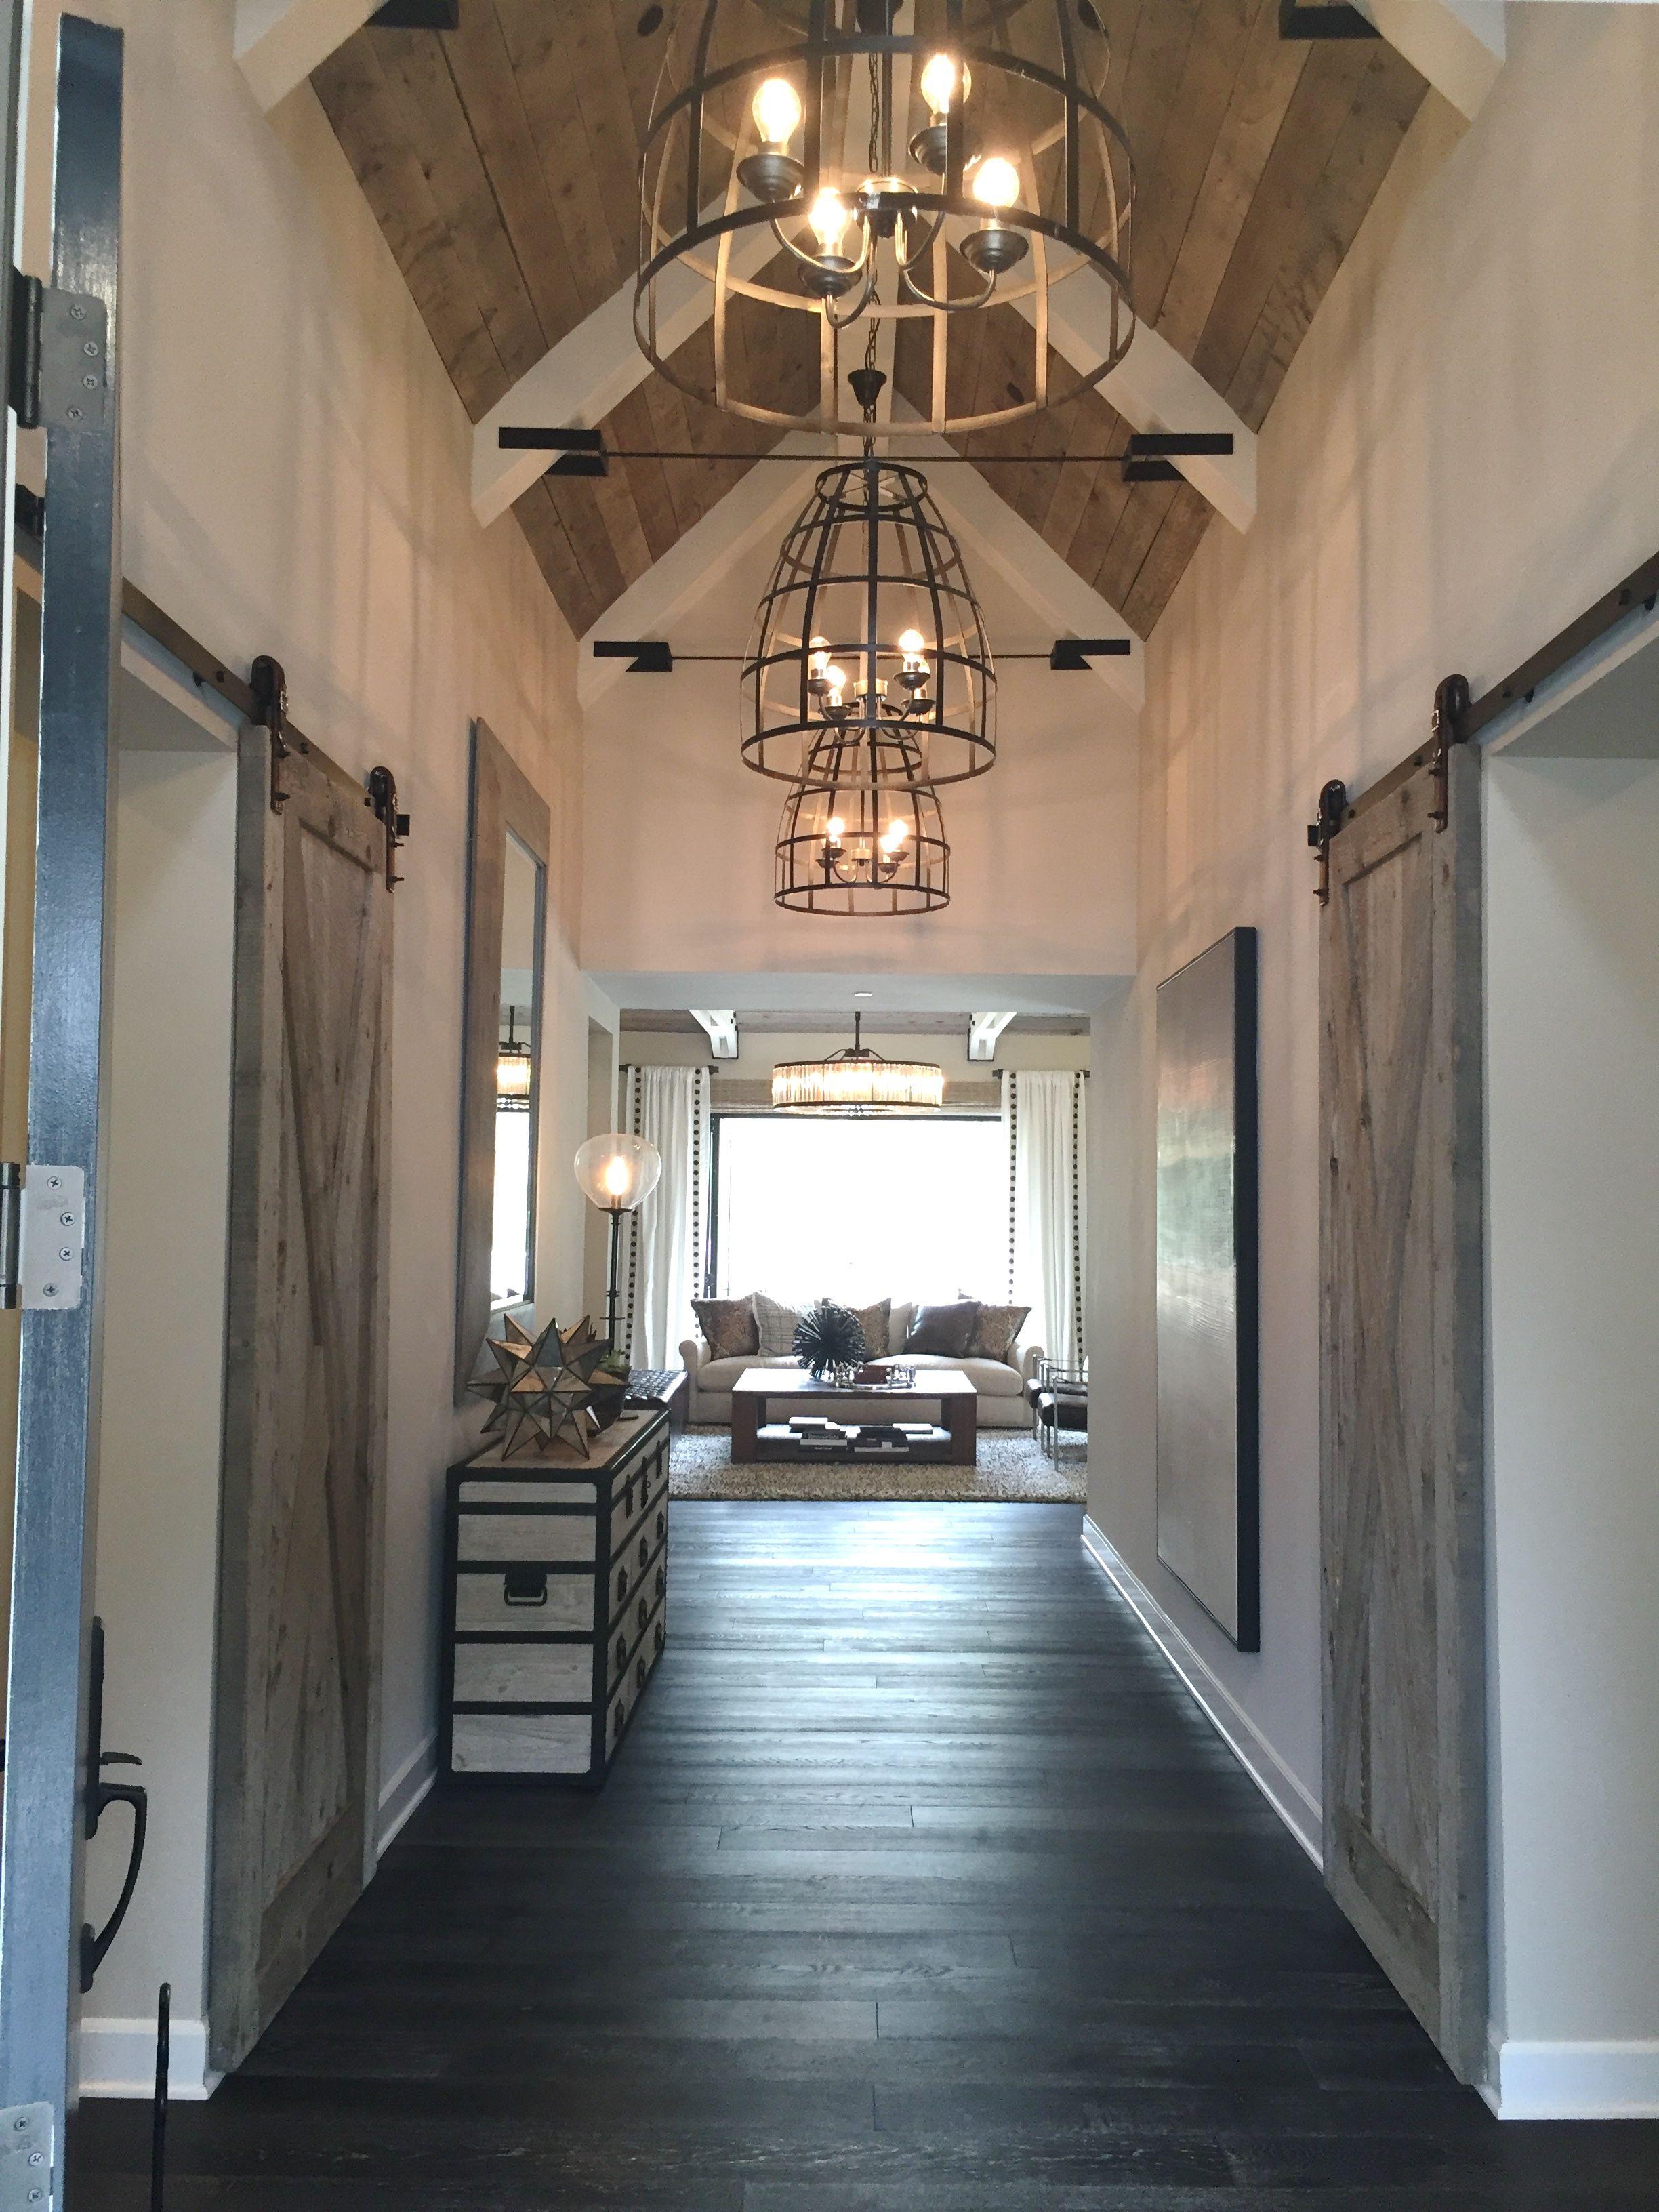 Create the design of your Barndominium Interior or let Barnd